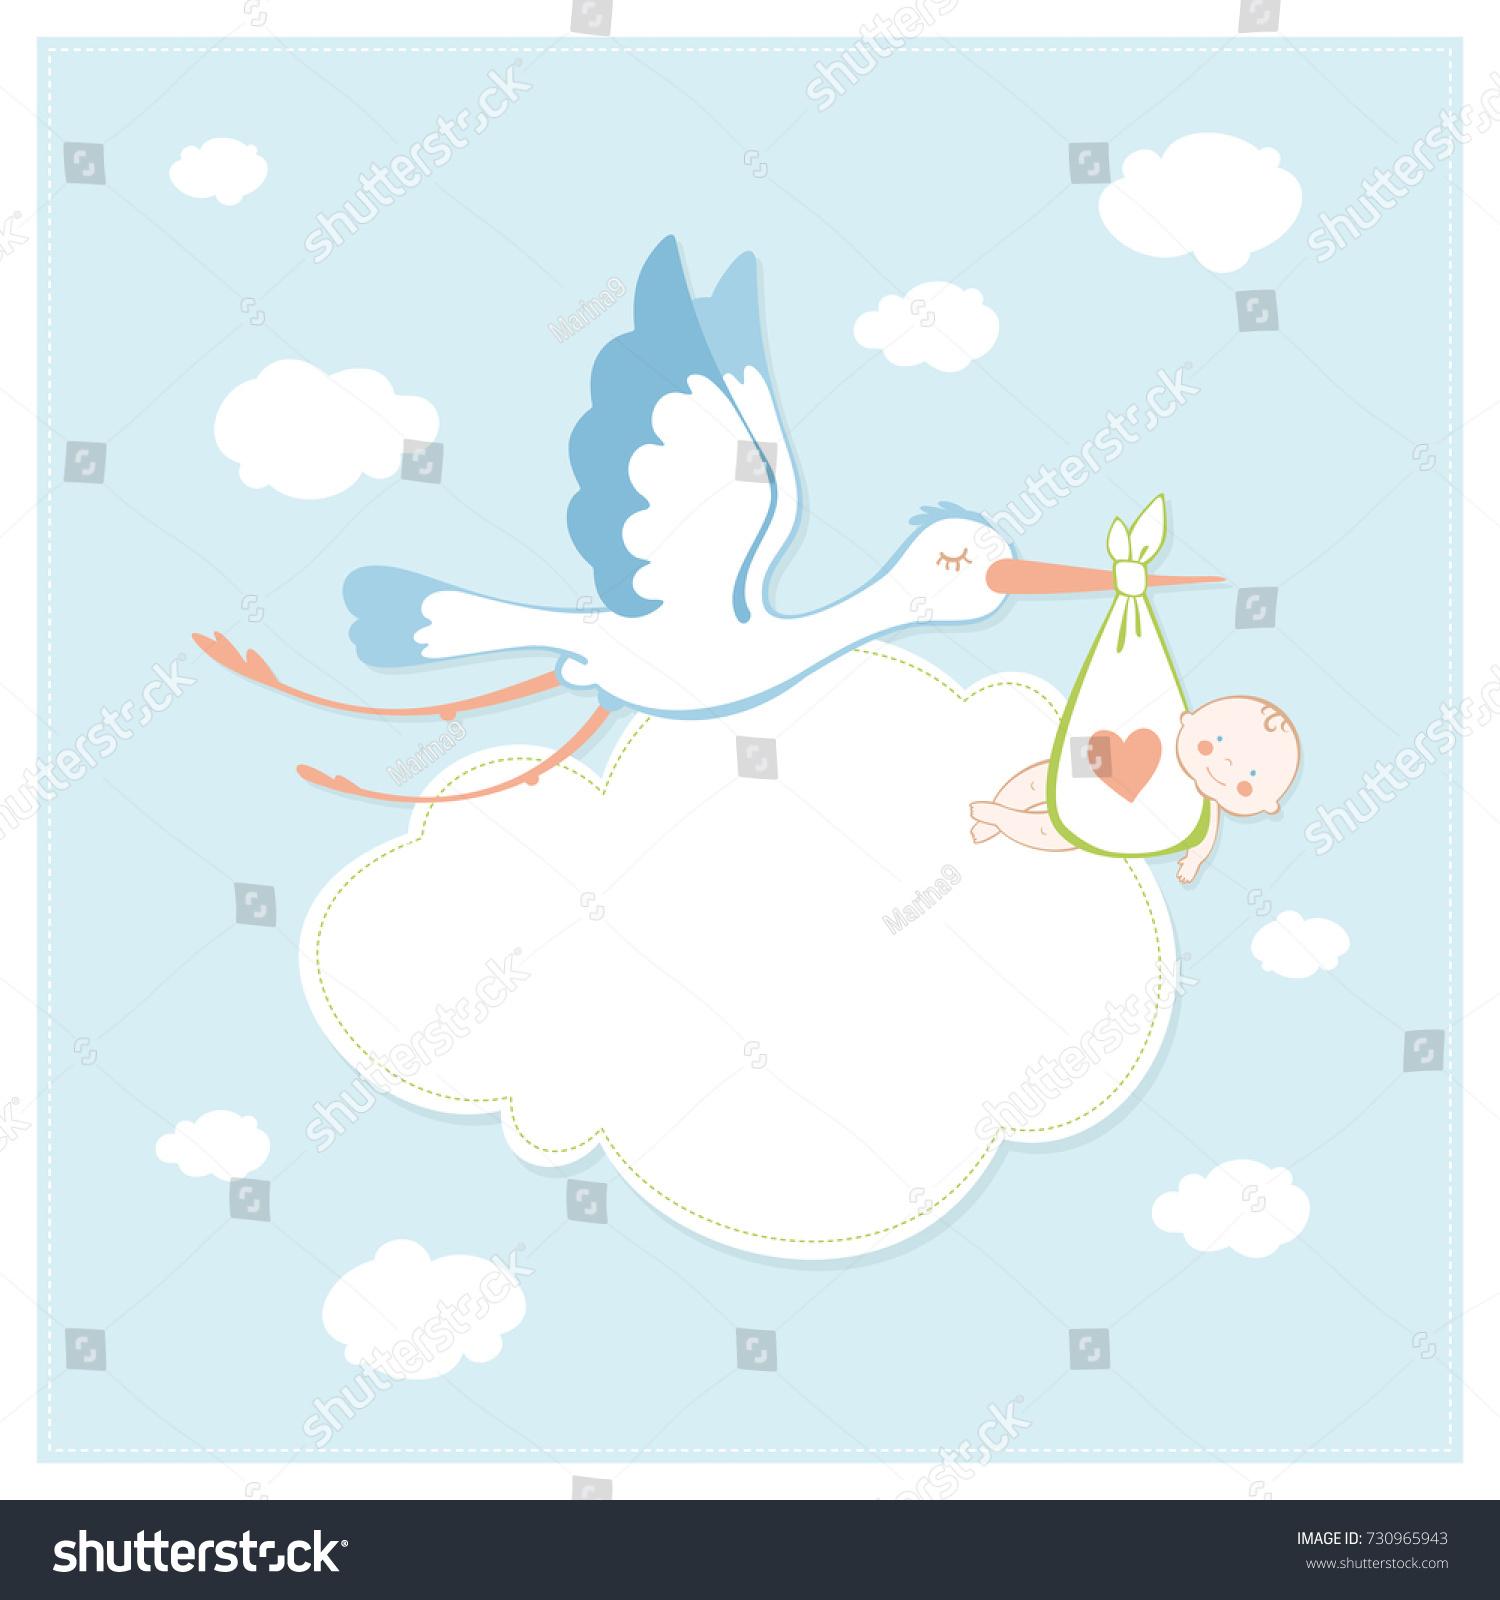 Stork Baby Shower Invitation Card Vector Stock Vector HD (Royalty ...